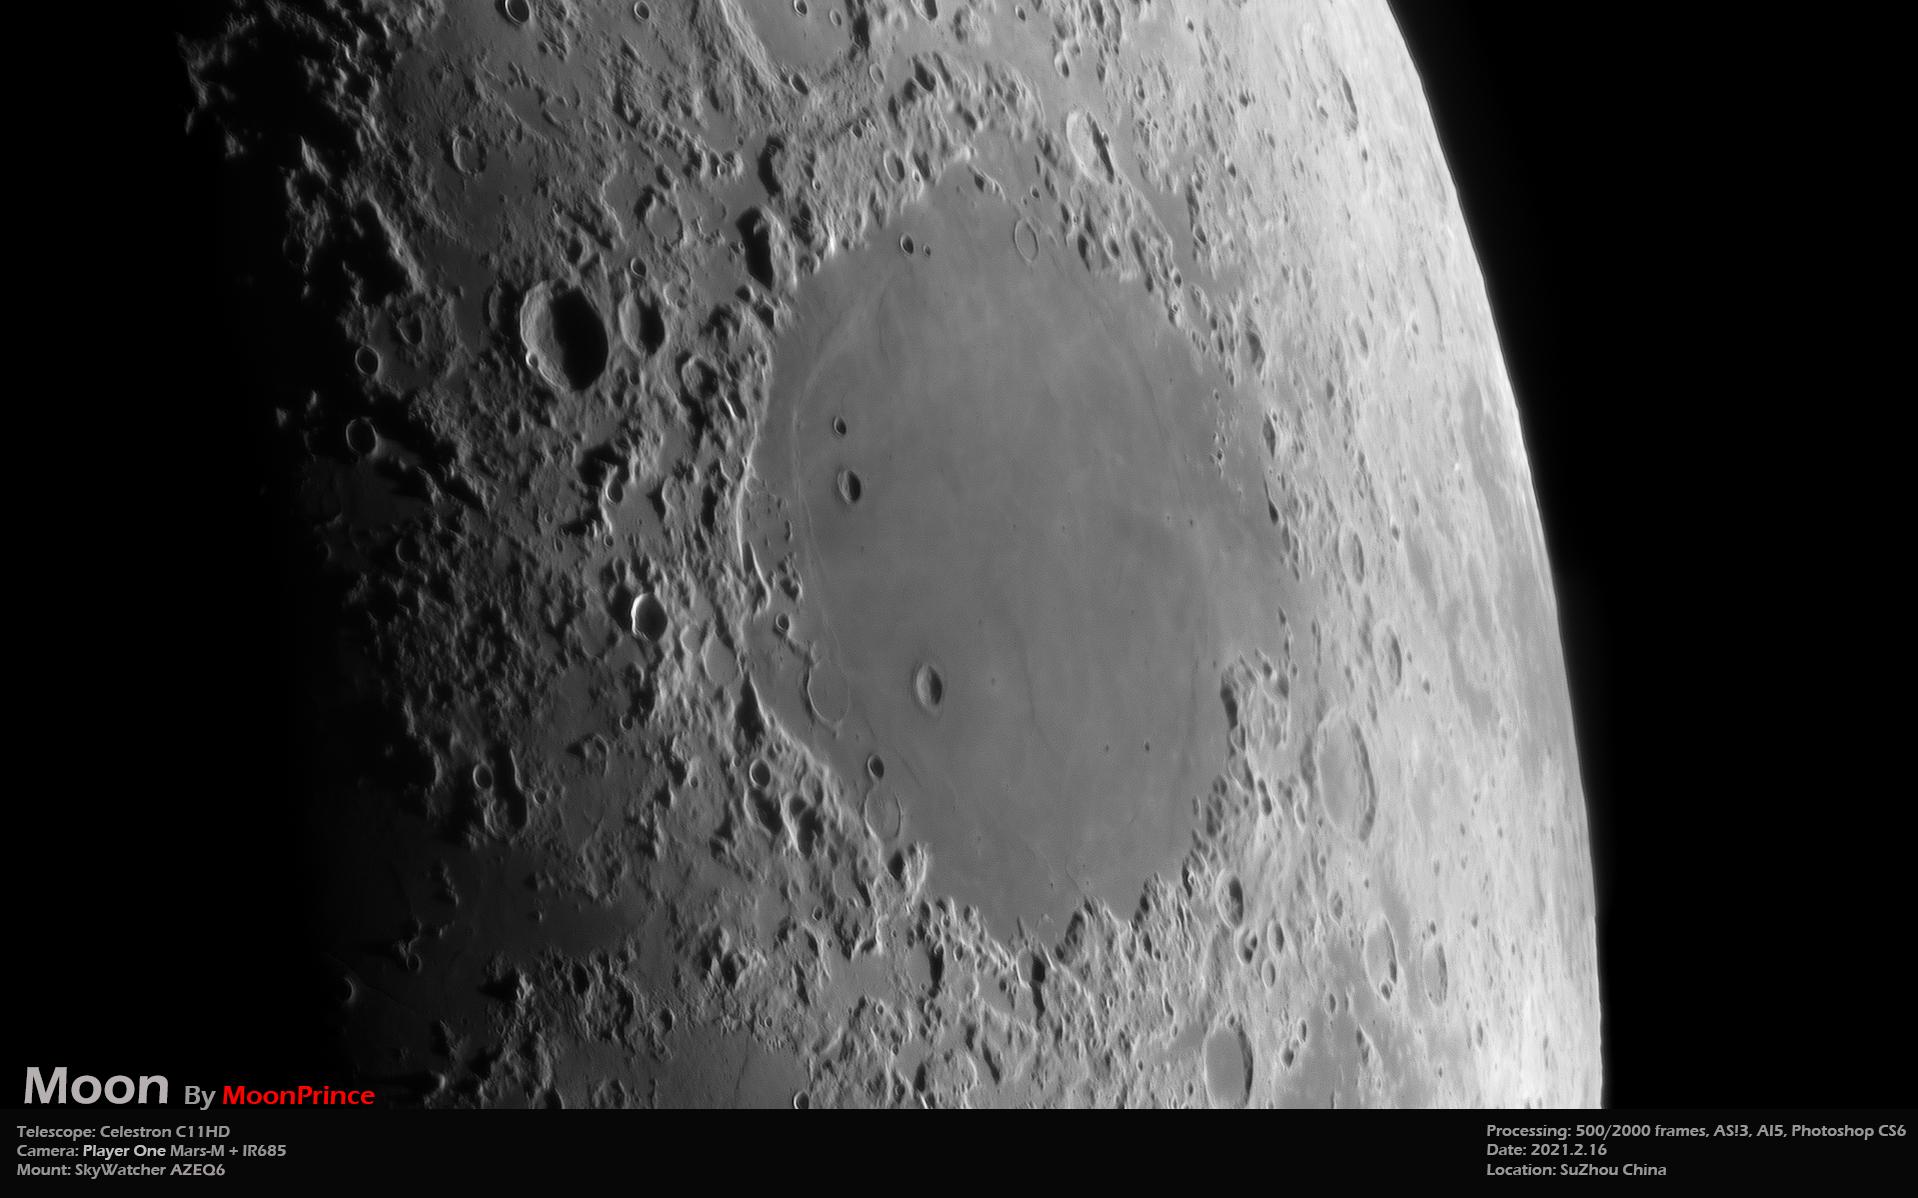 Moon20210216-S4.jpg